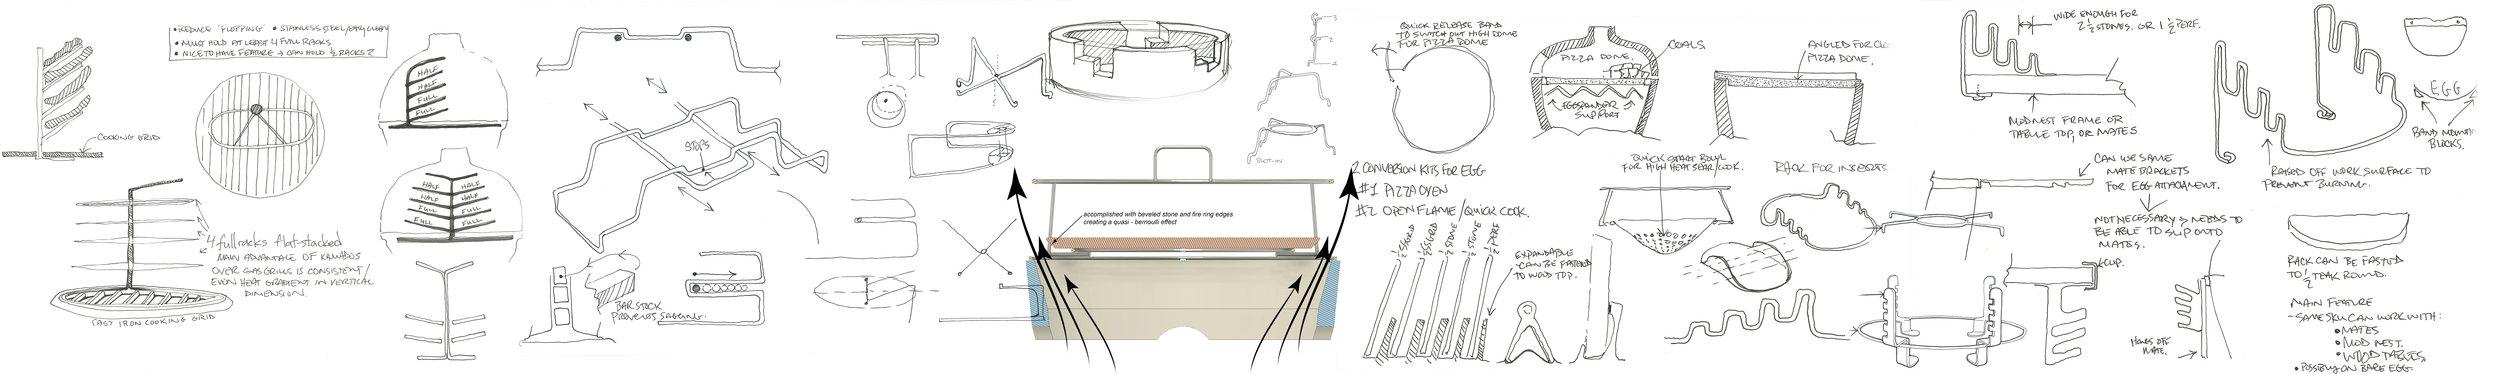 EGGspander sketchpage sequence.jpg